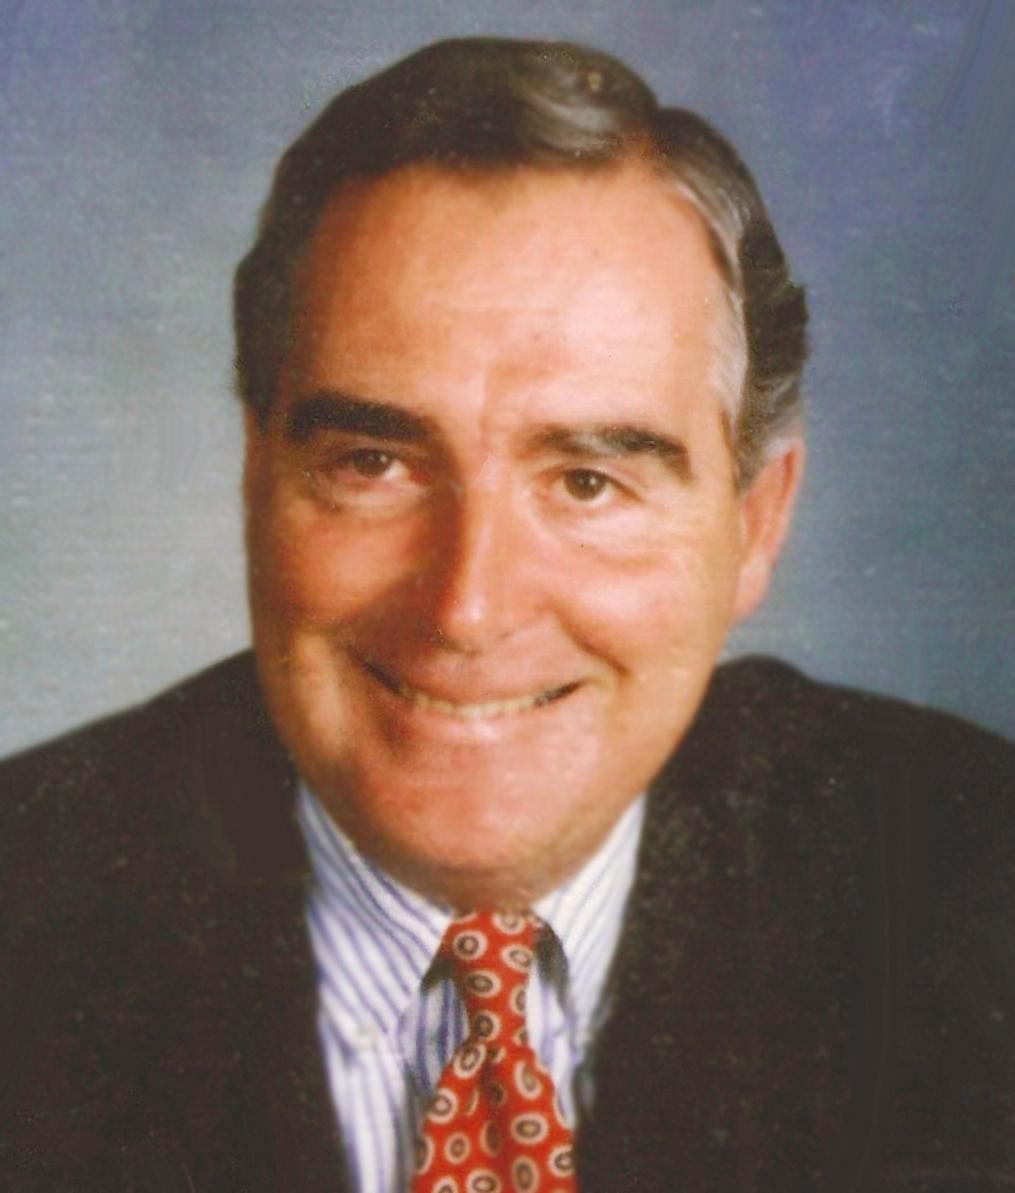 JOHN MICHAEL BRINCK